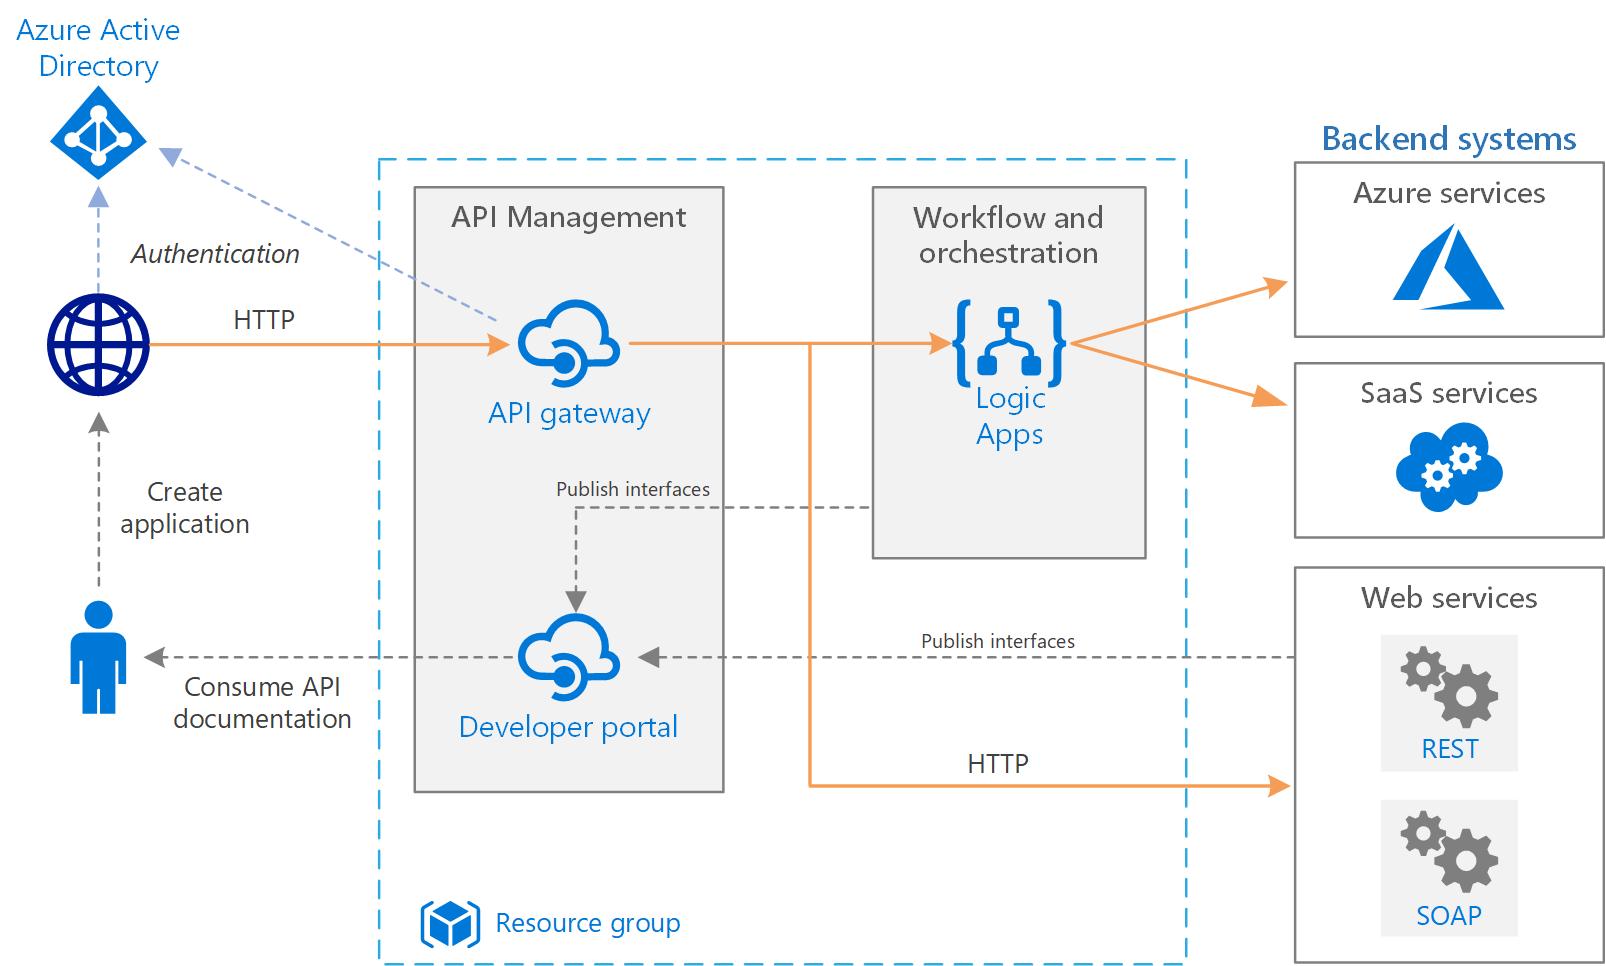 Basic enterprise integration on Azure